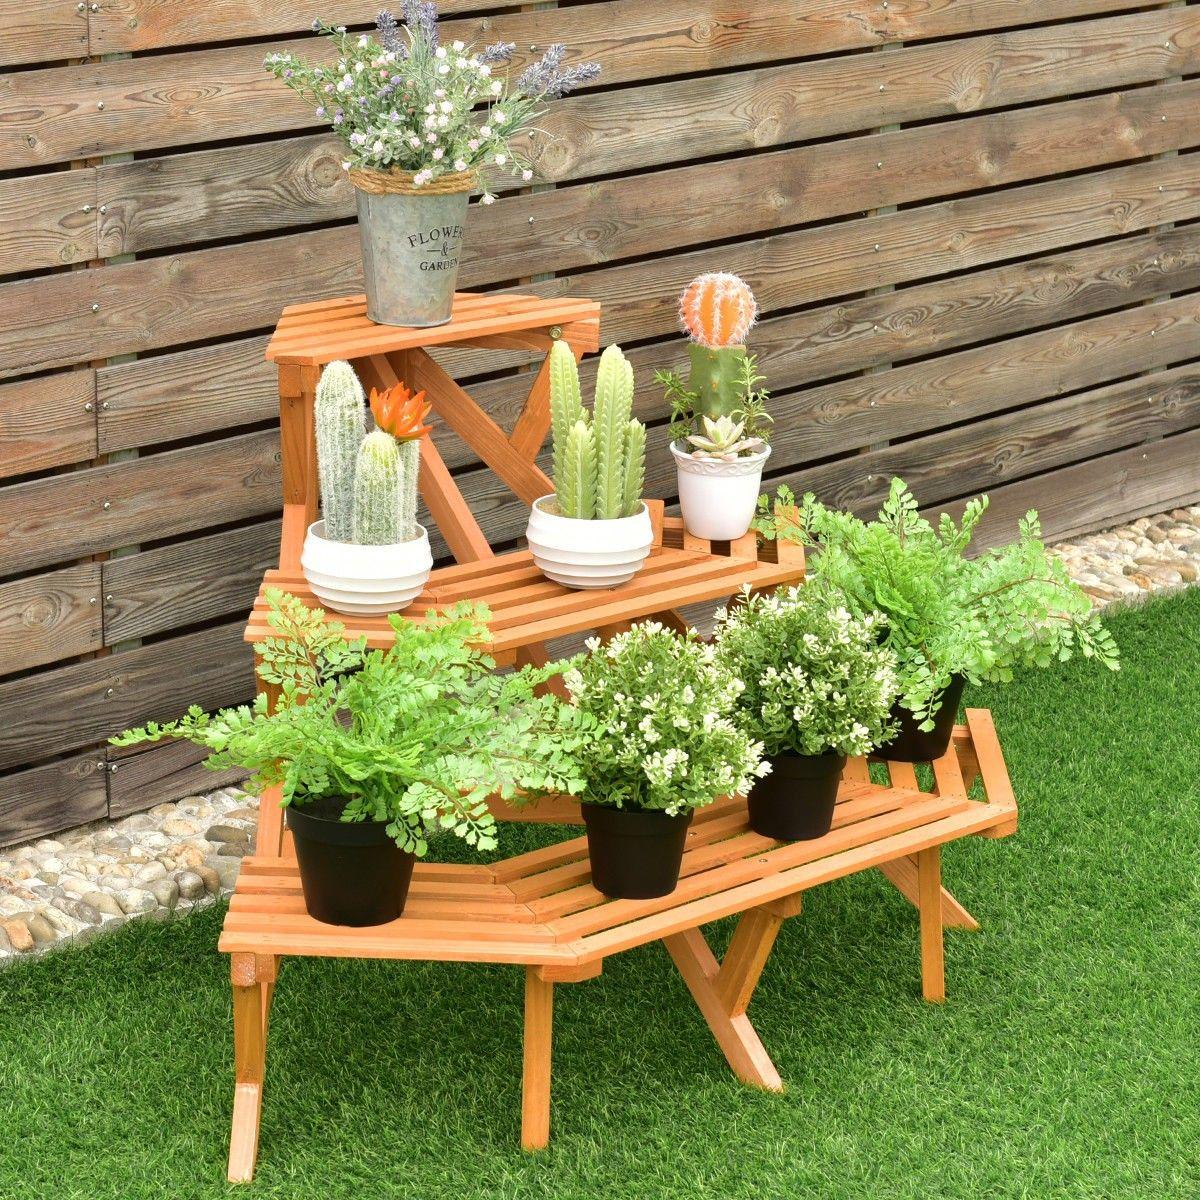 3 Tier Wood Corner #Plant Ladder Pot Holder Rack | Home & Garden ...